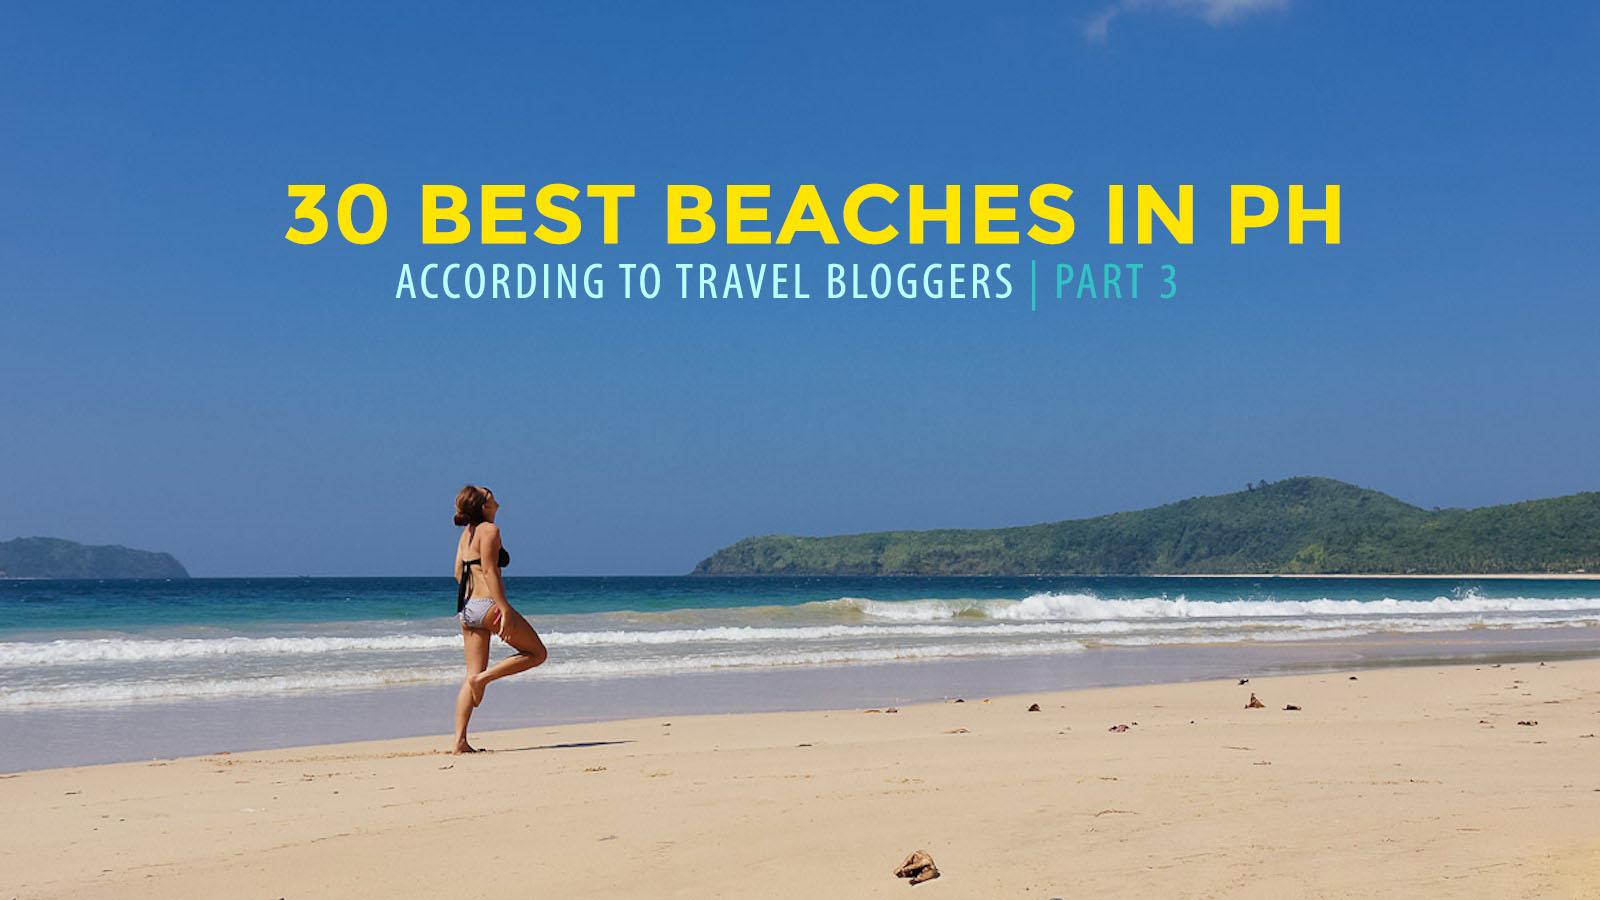 Philippines Best Beaches Near Manila